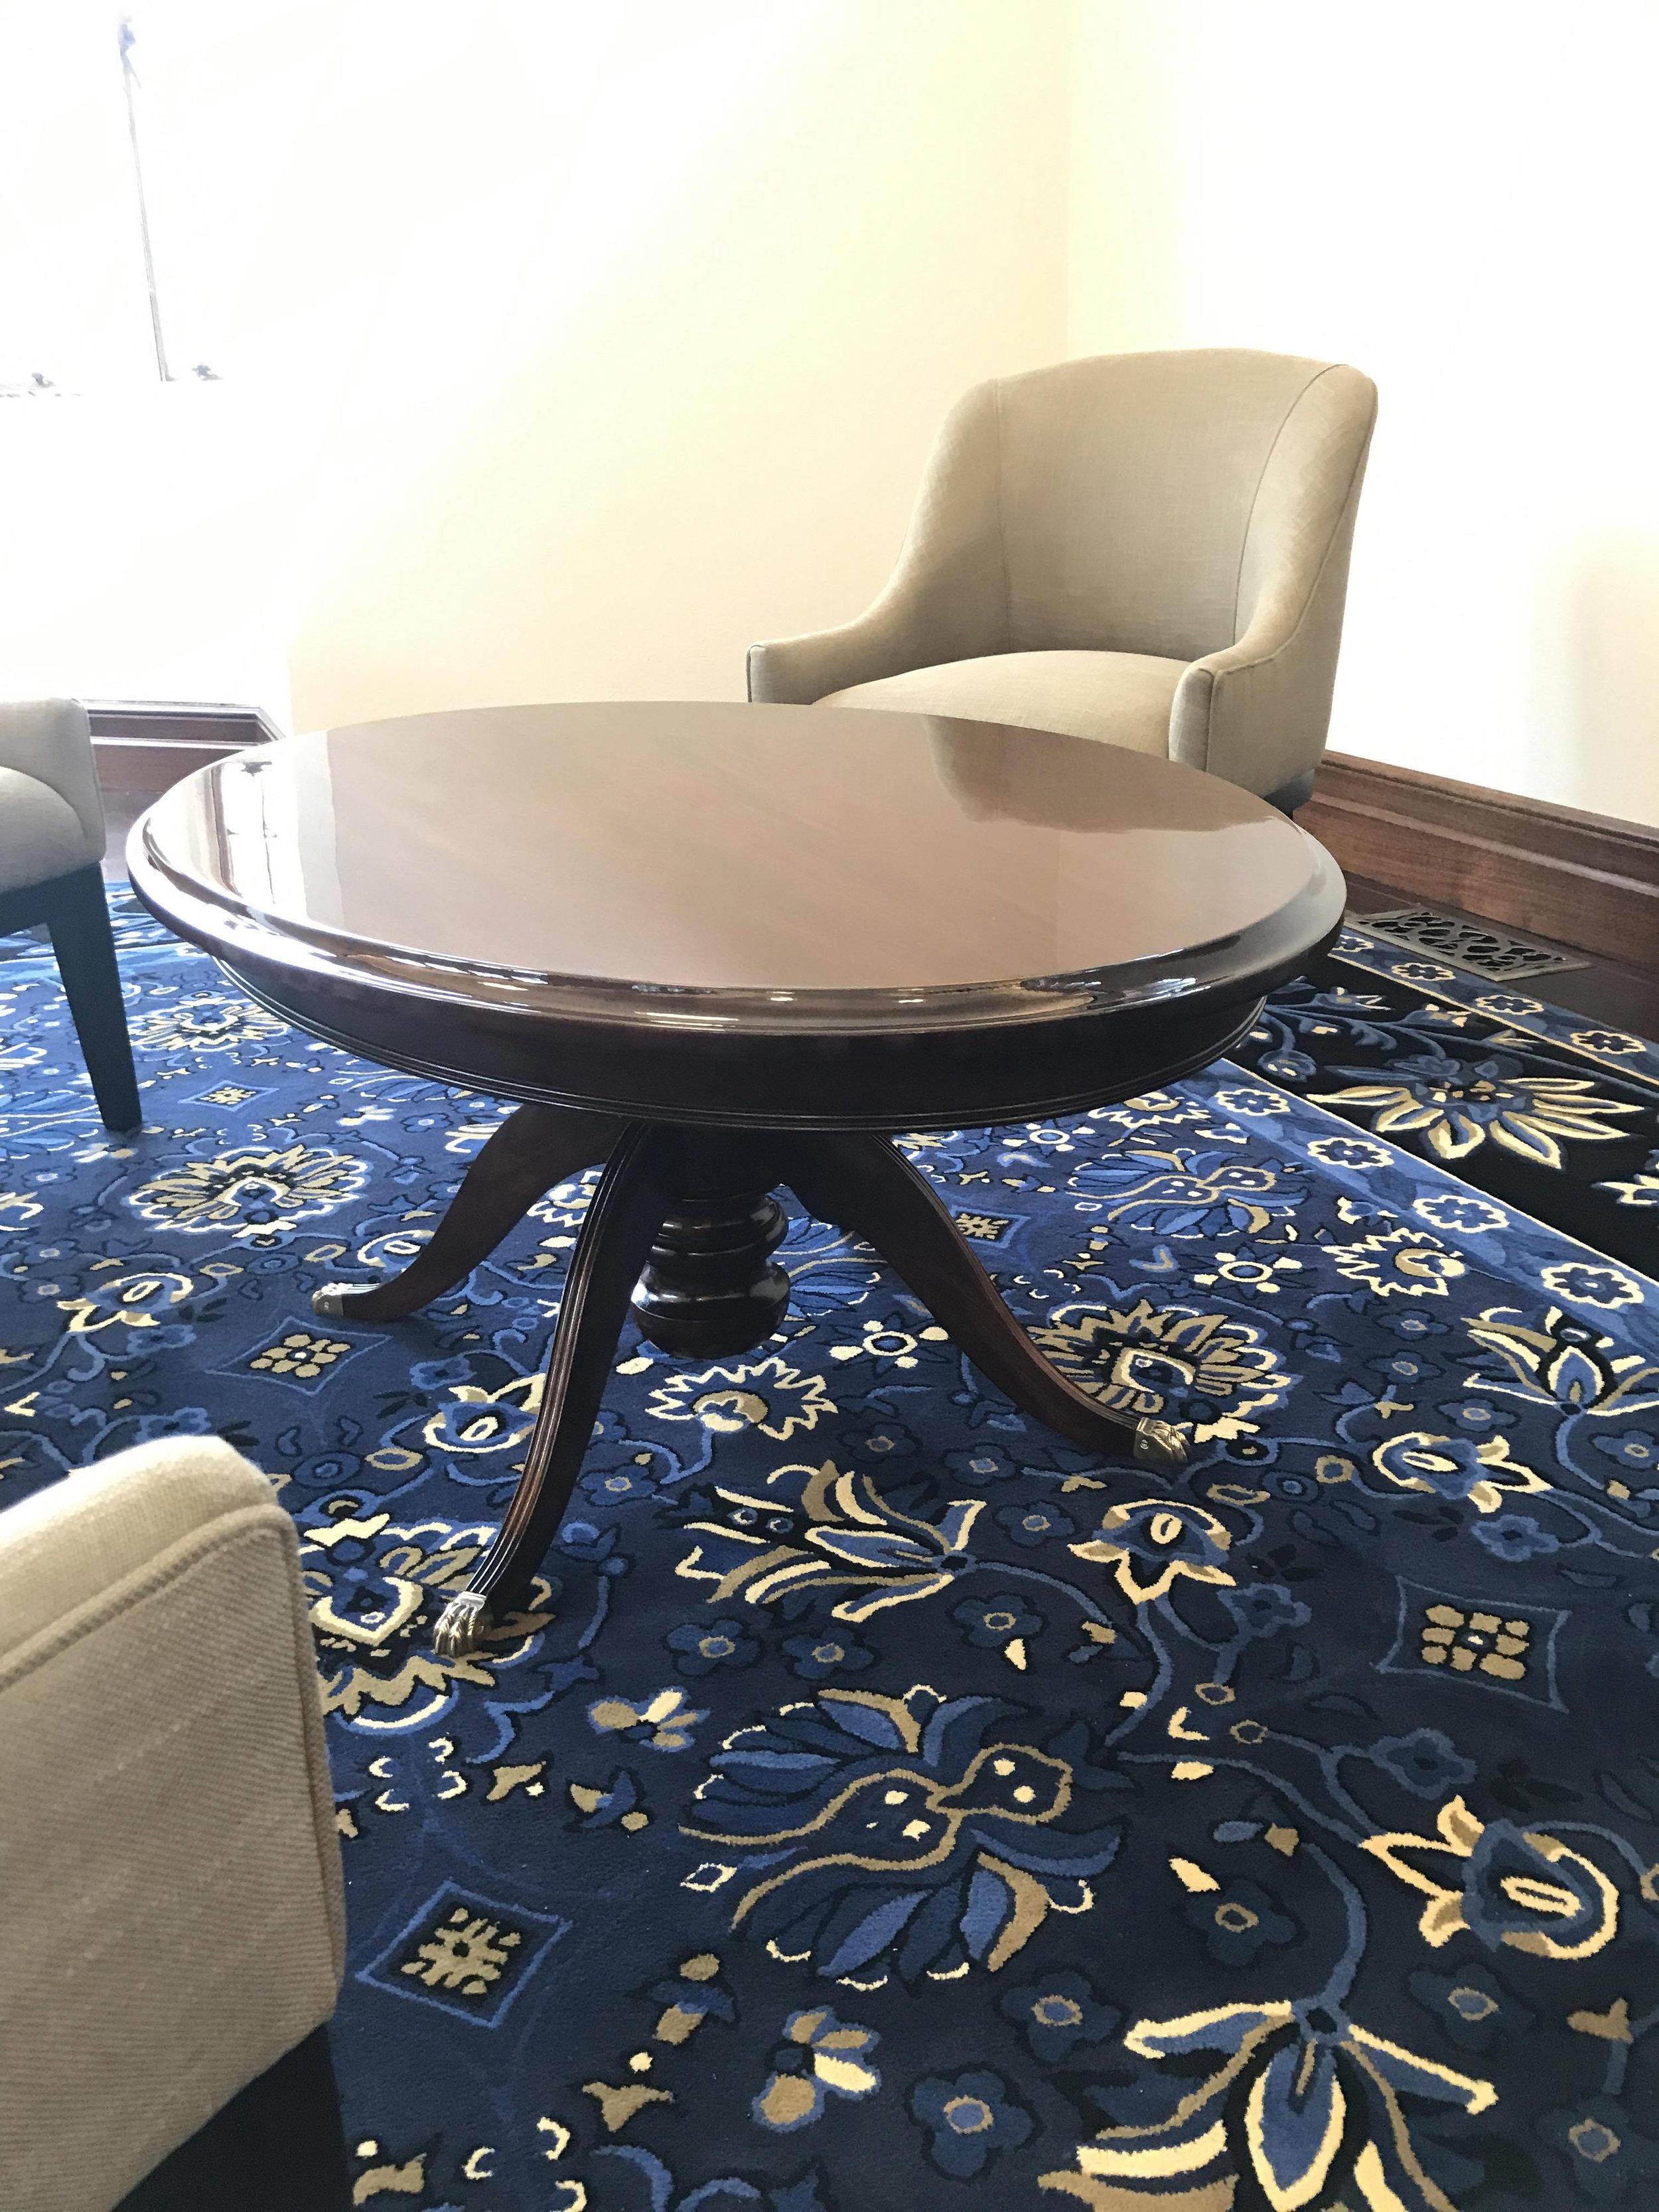 mahogany coffee table.JPG